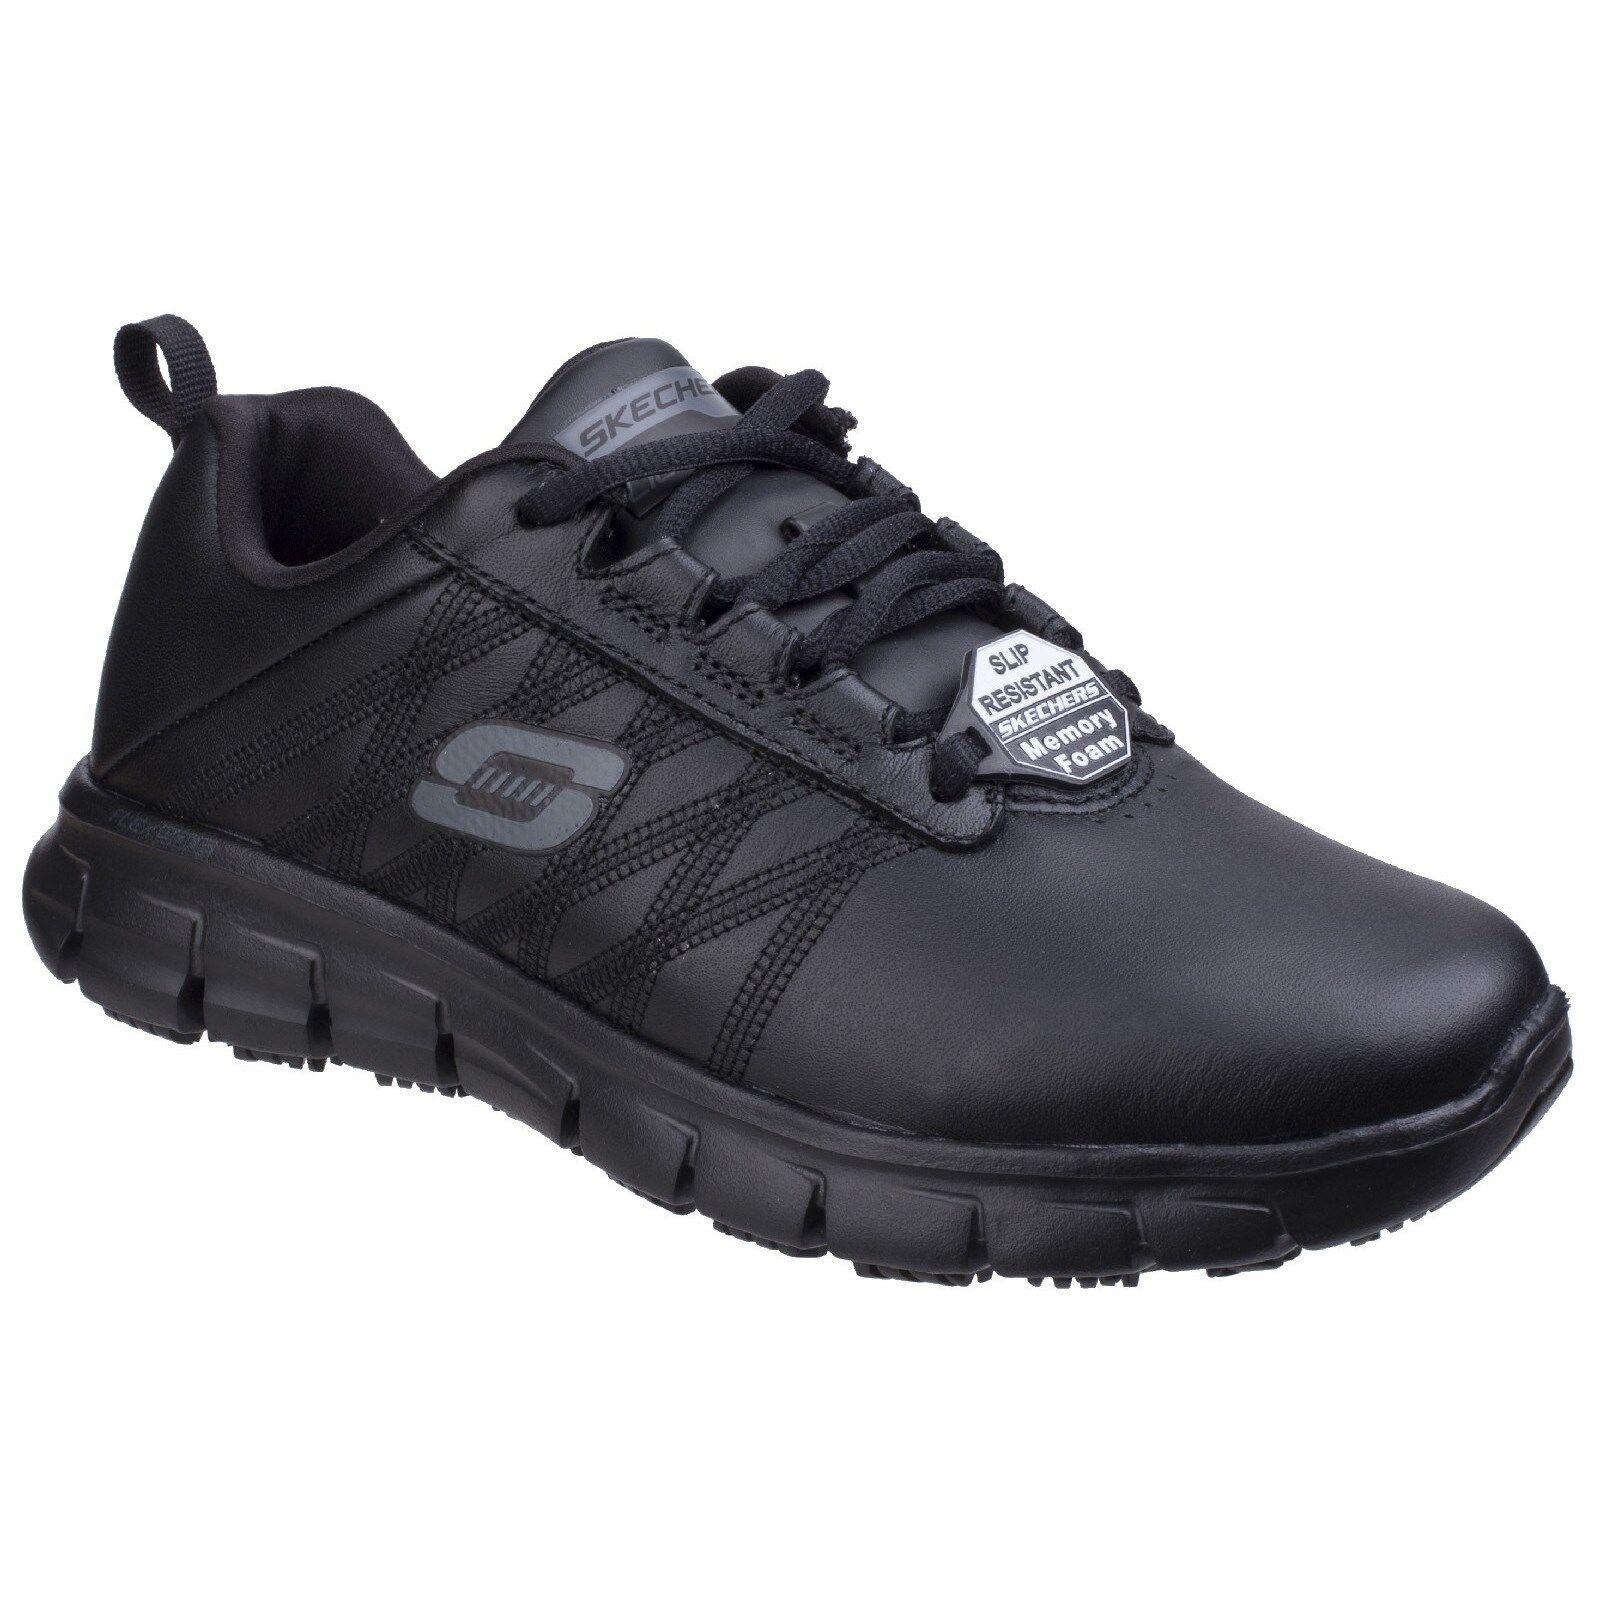 Skechers Sure Track Erath SR Work Trainers Memory Foam Leder Damenschuhe Schuhes